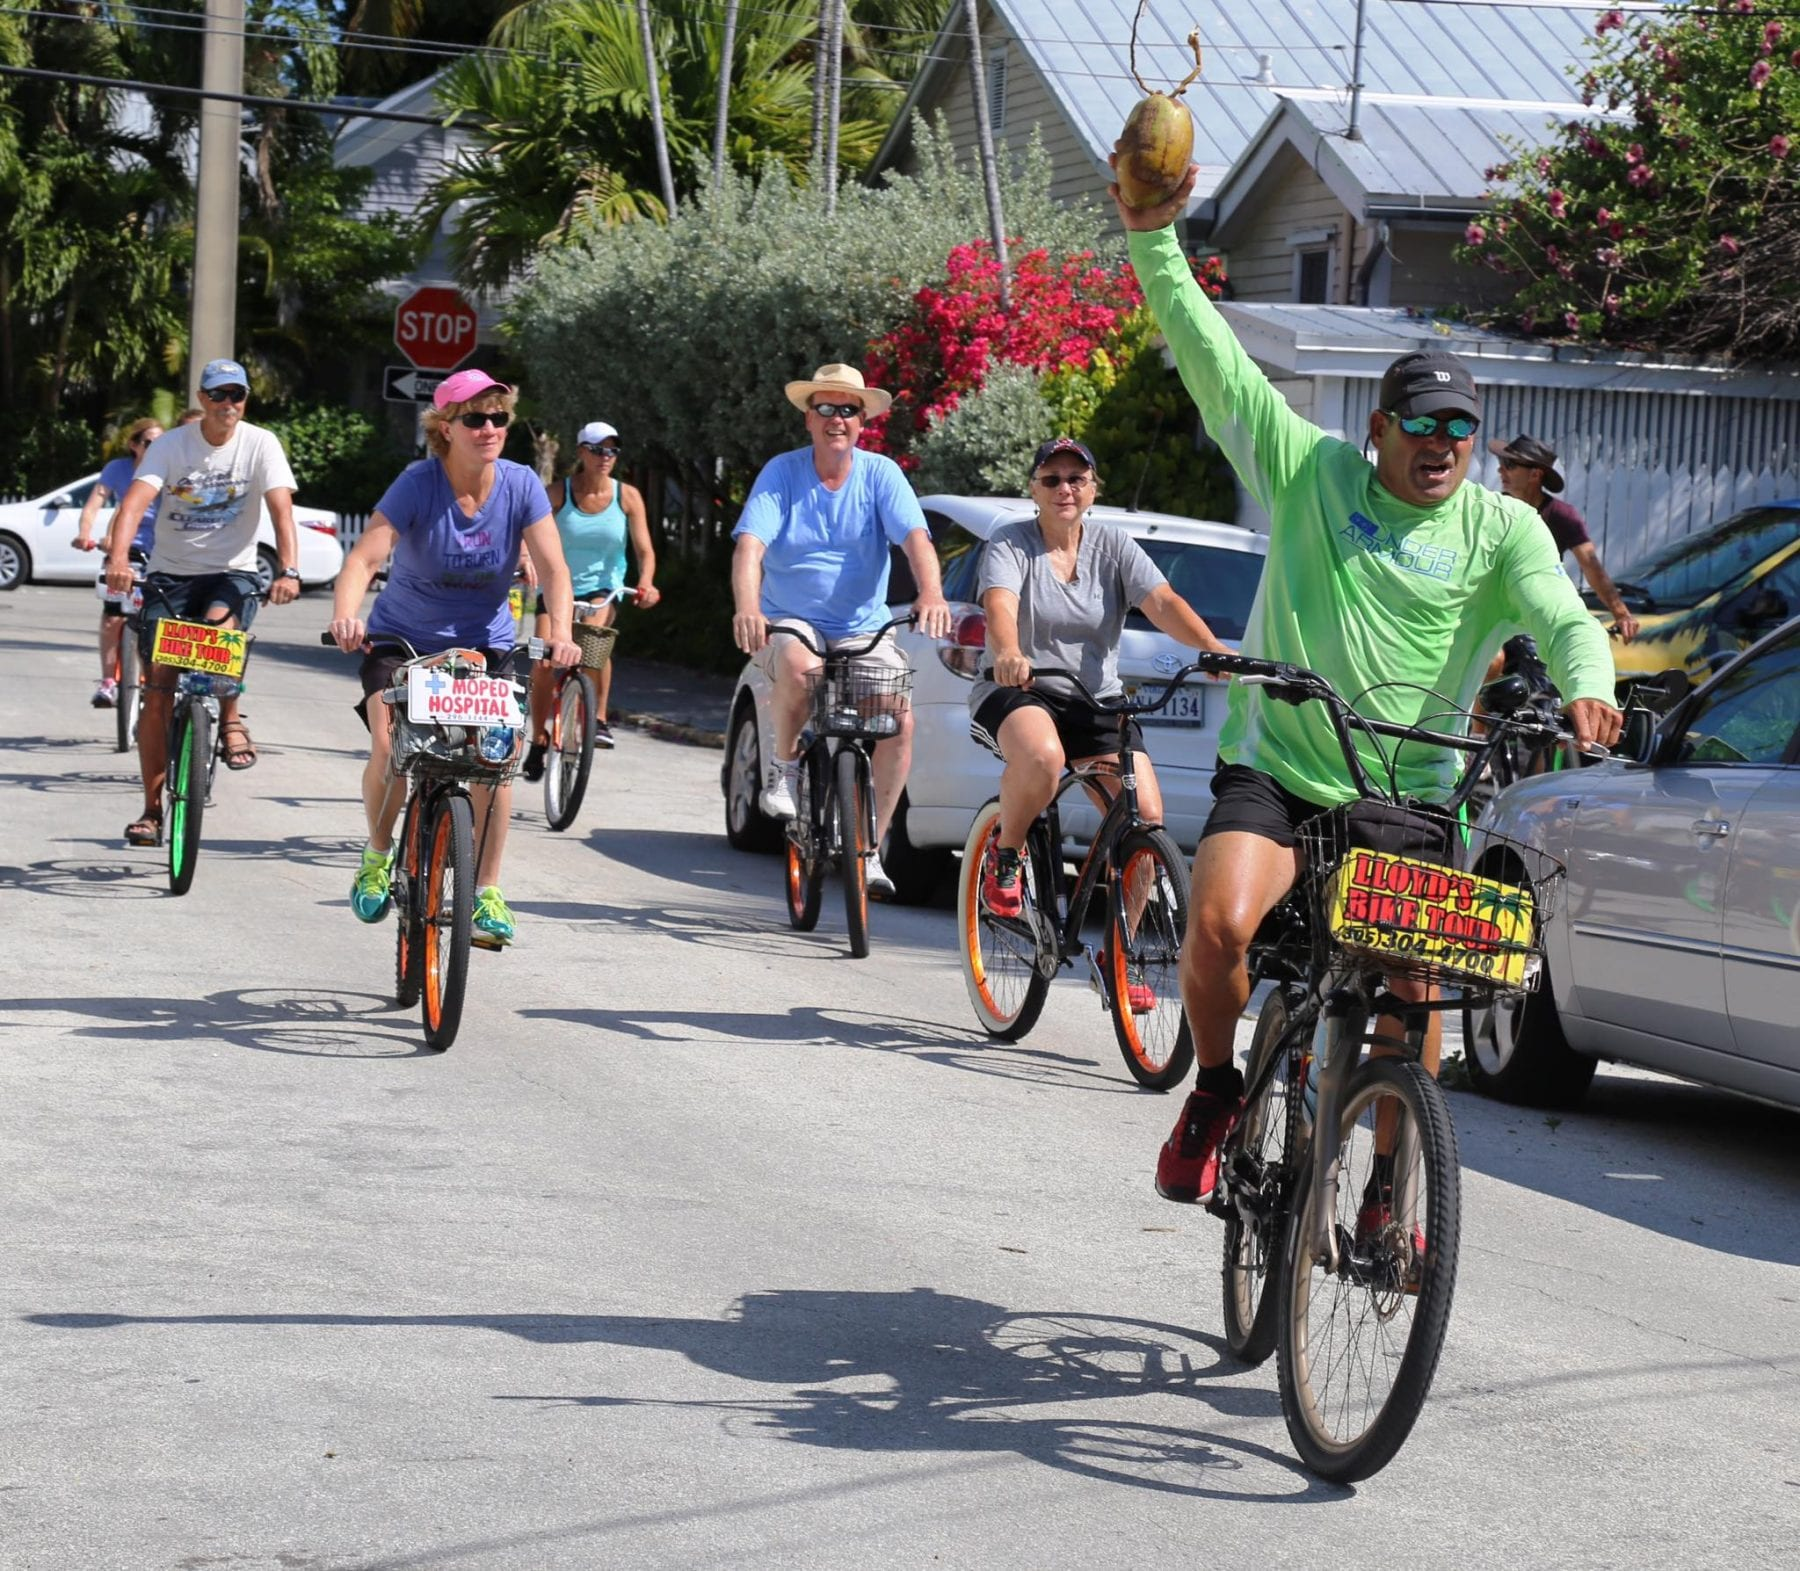 Lloyd's Tropical Bike Tours